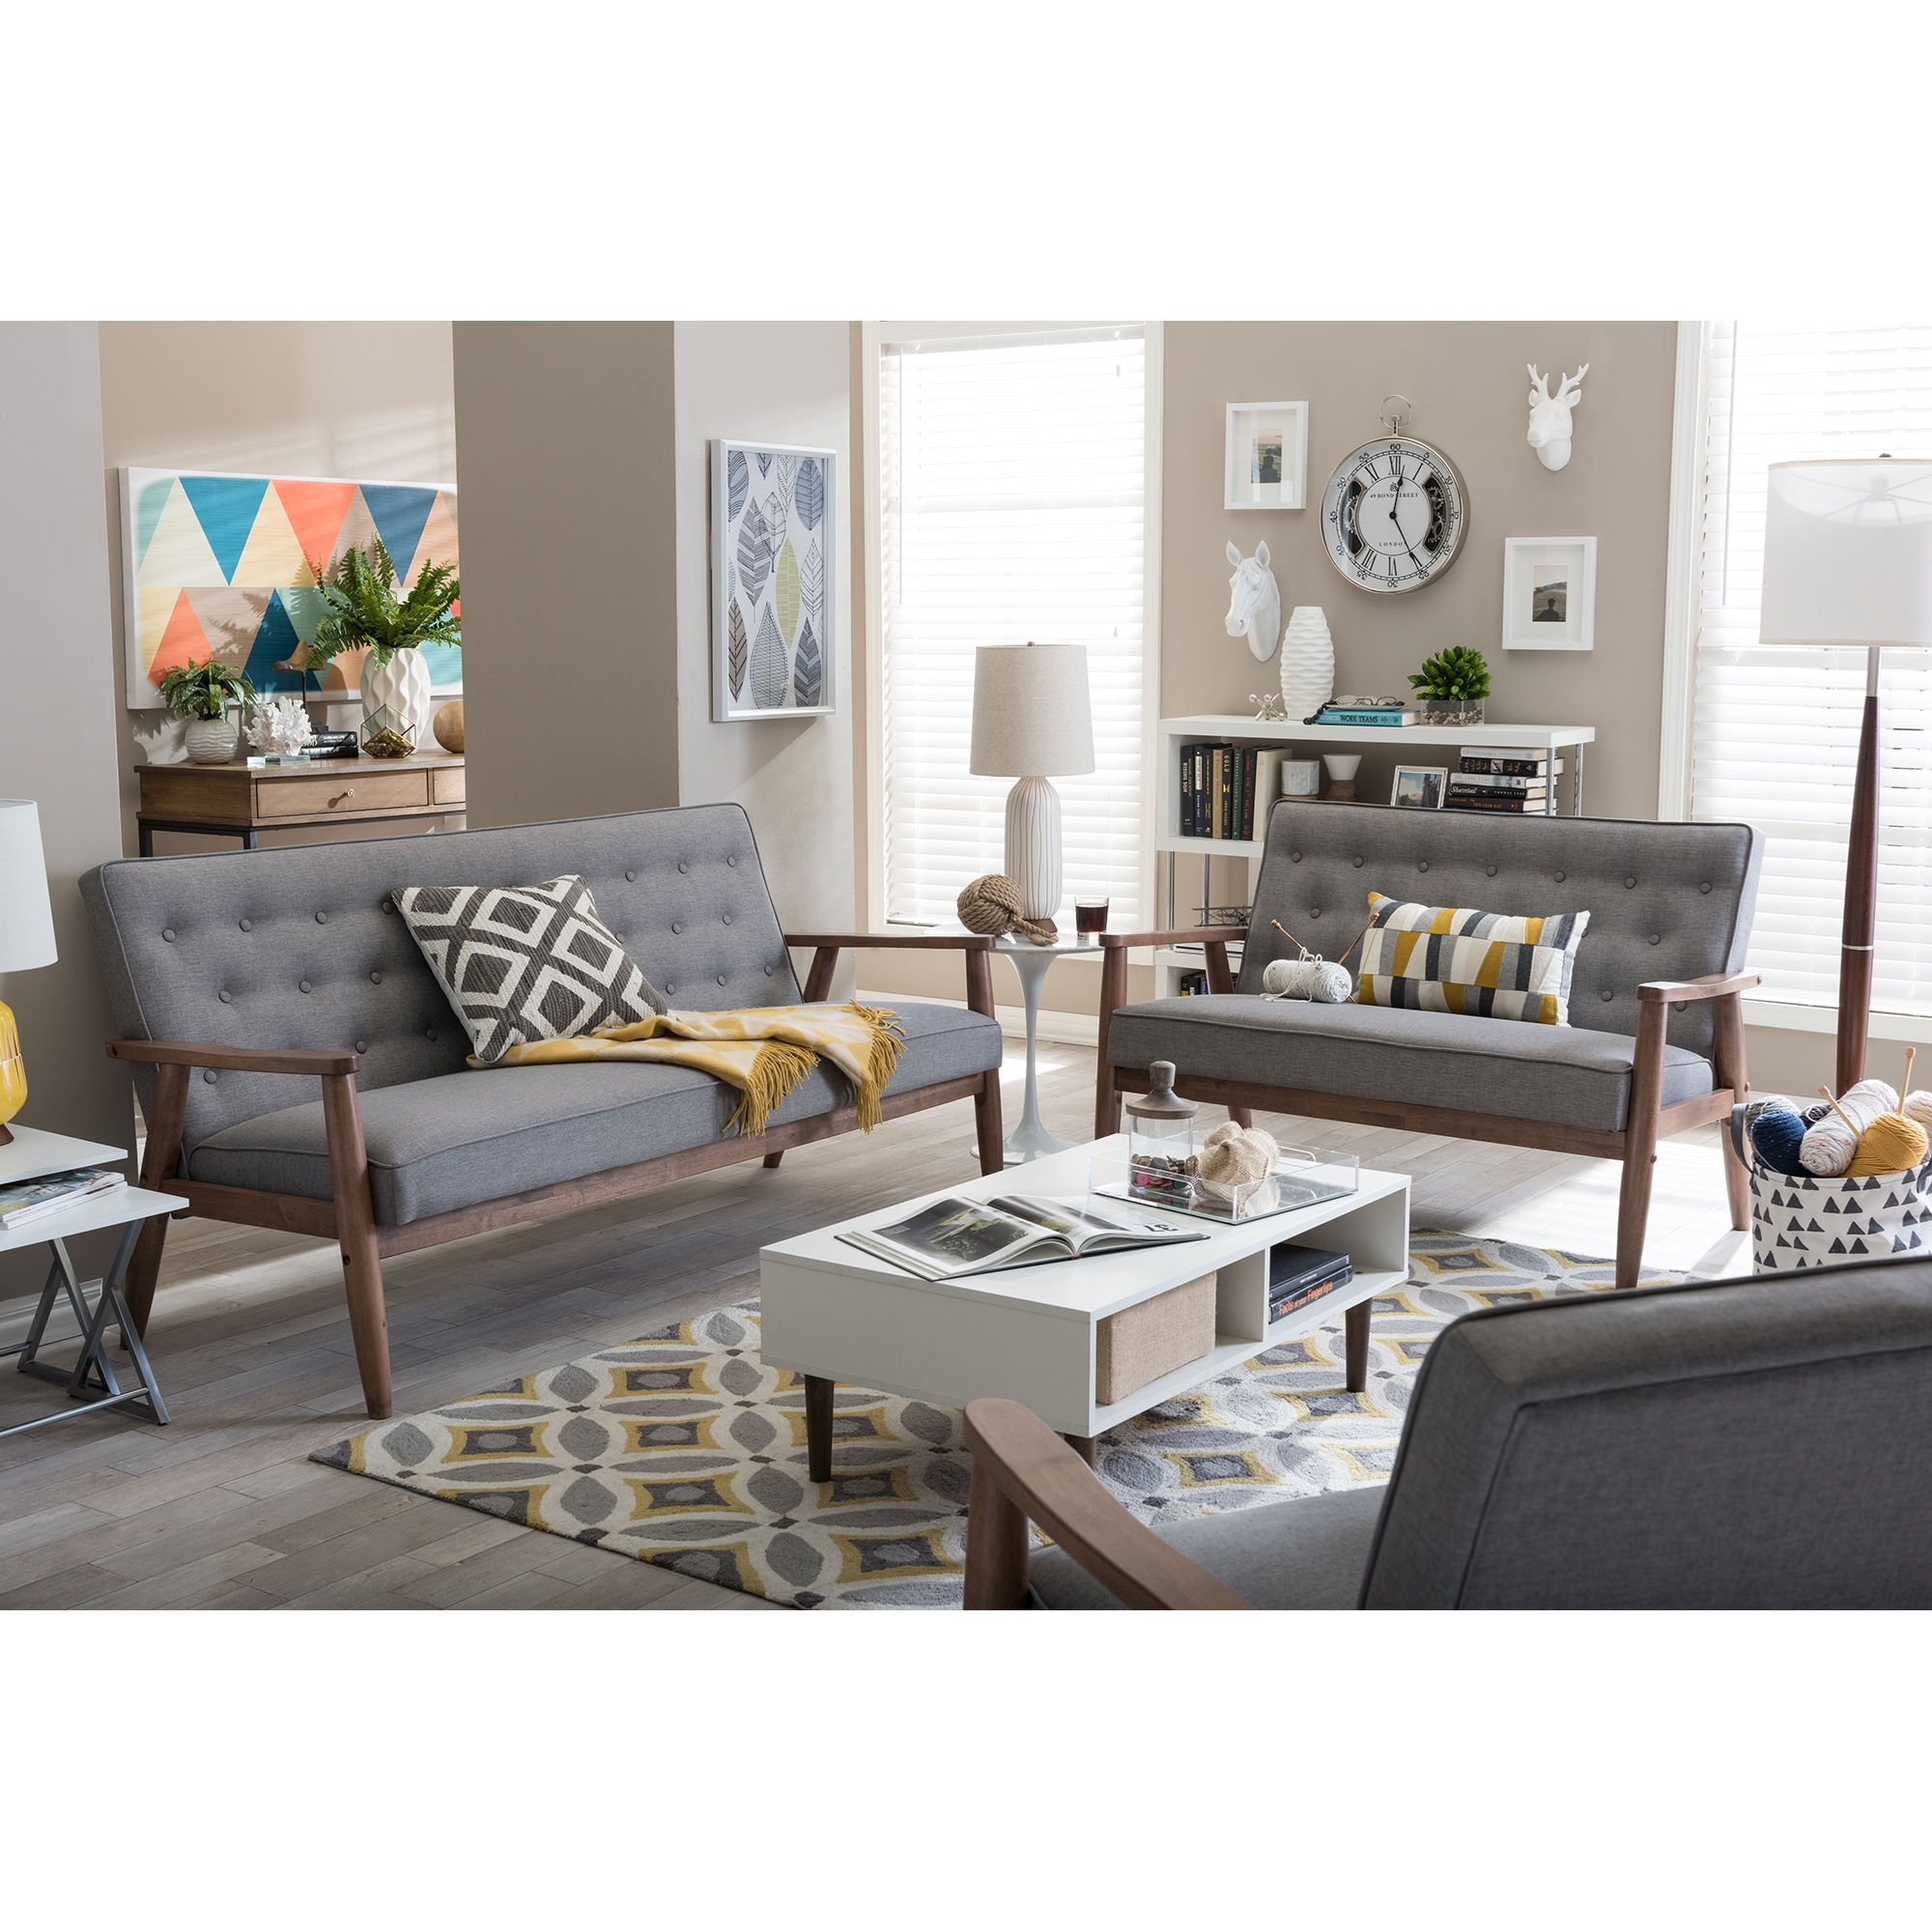 ... Baxton Studio Sorrento Mid Century Retro Modern Grey Fabric Upholstered  Wooden 3 Piece Living Room